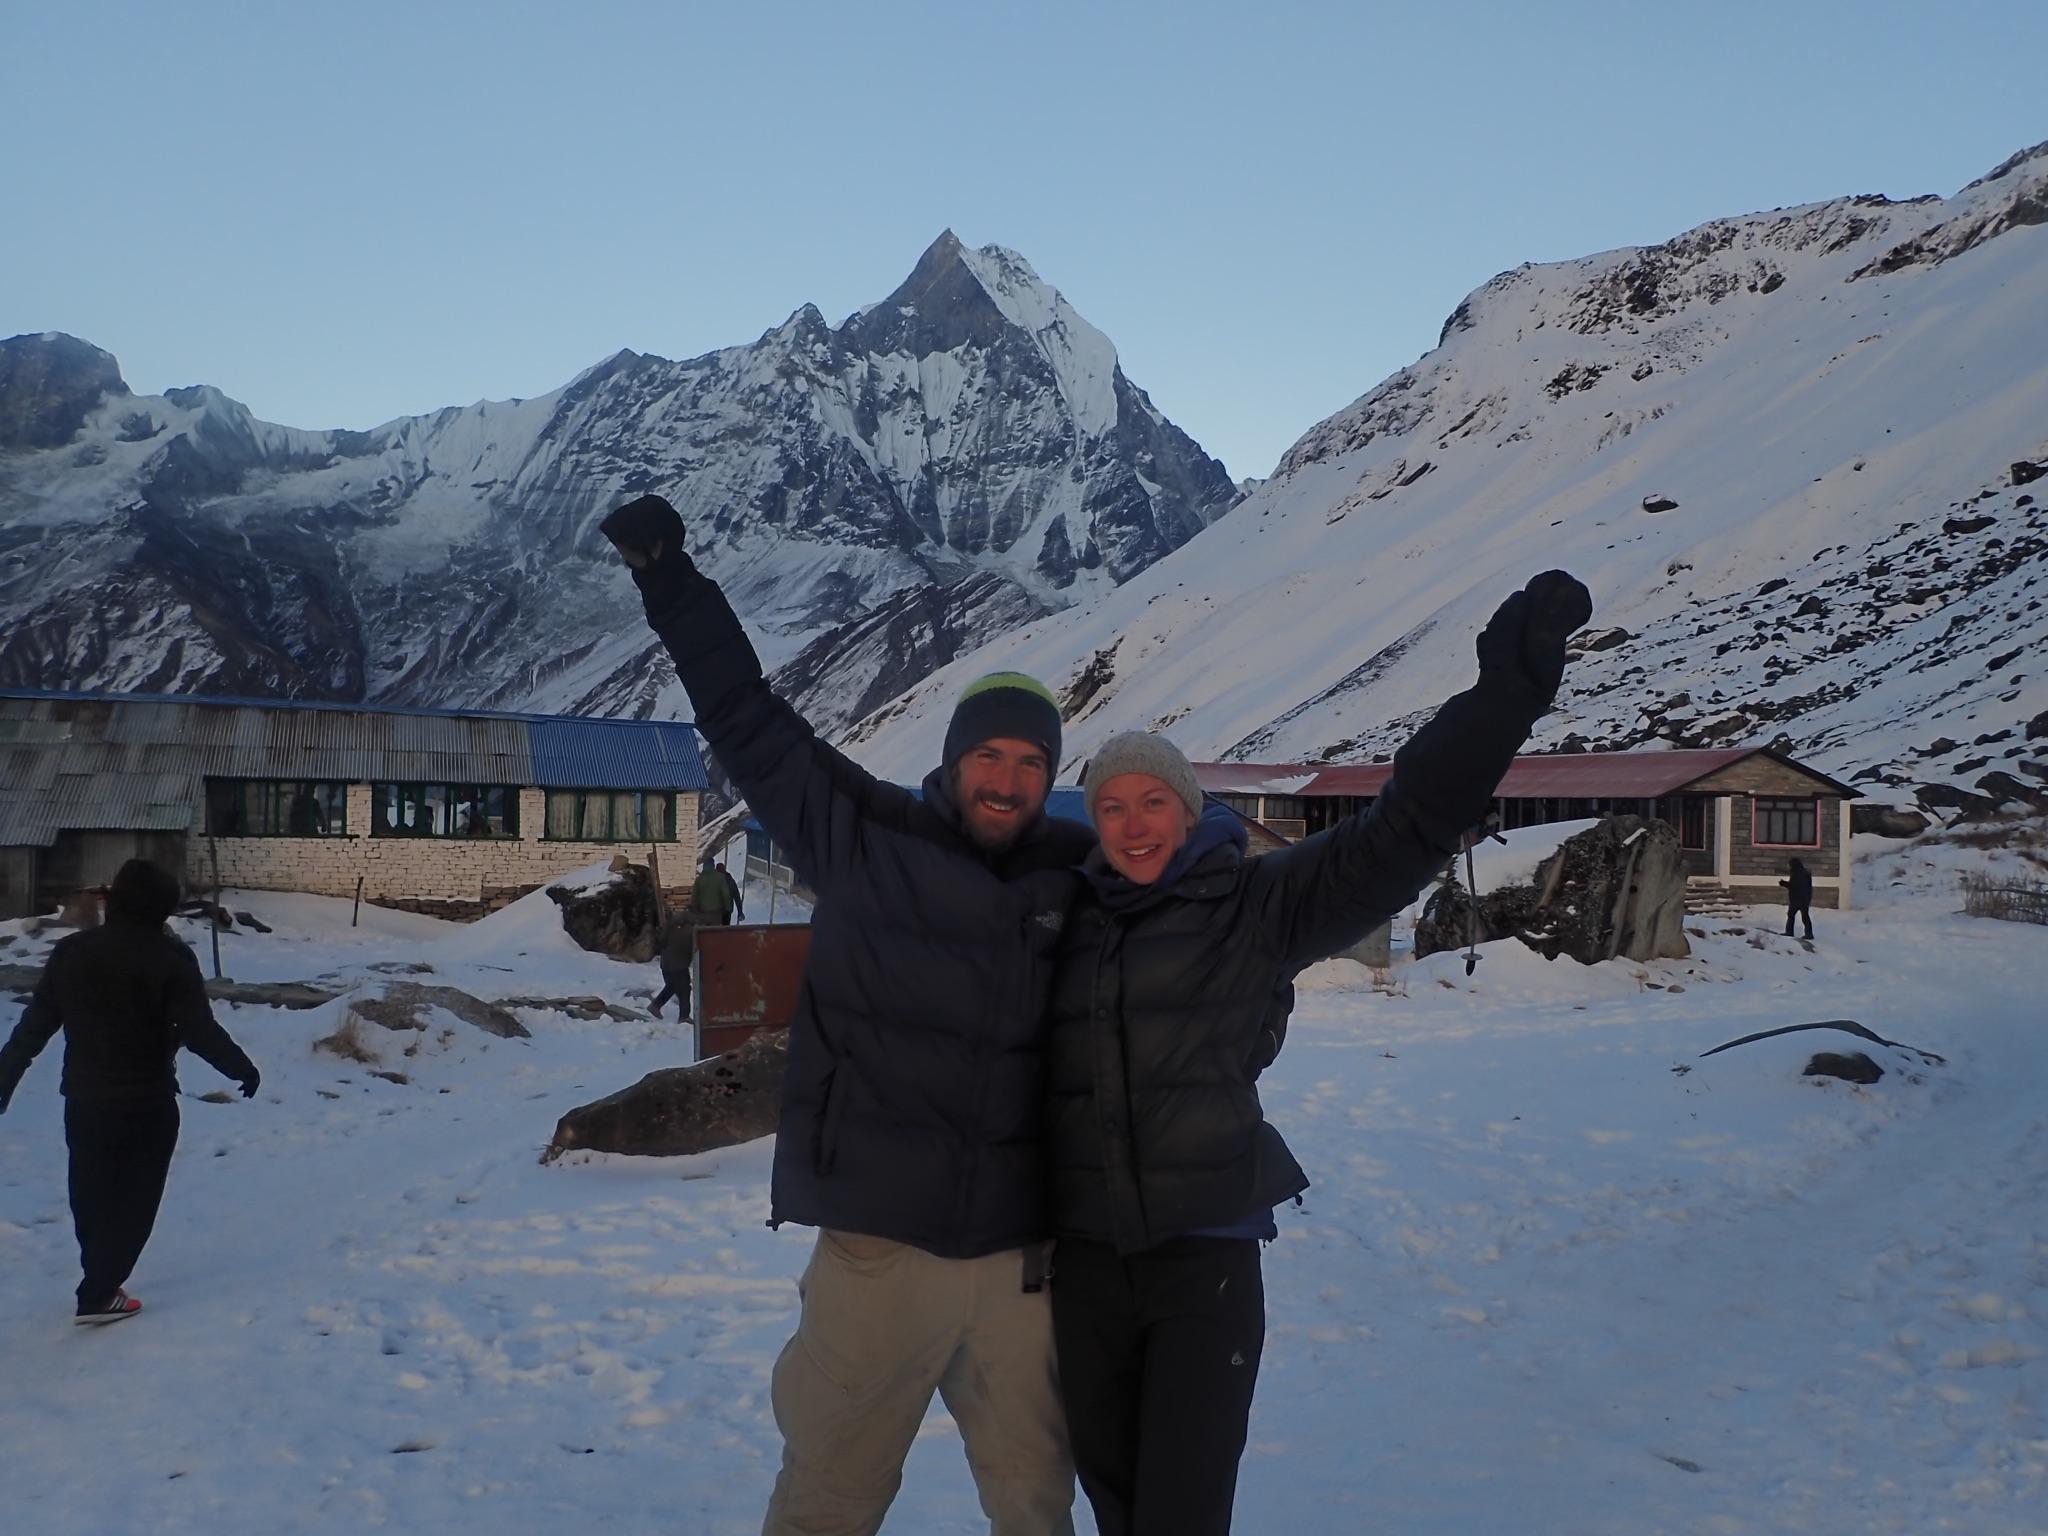 Getting to Annapurna base camp